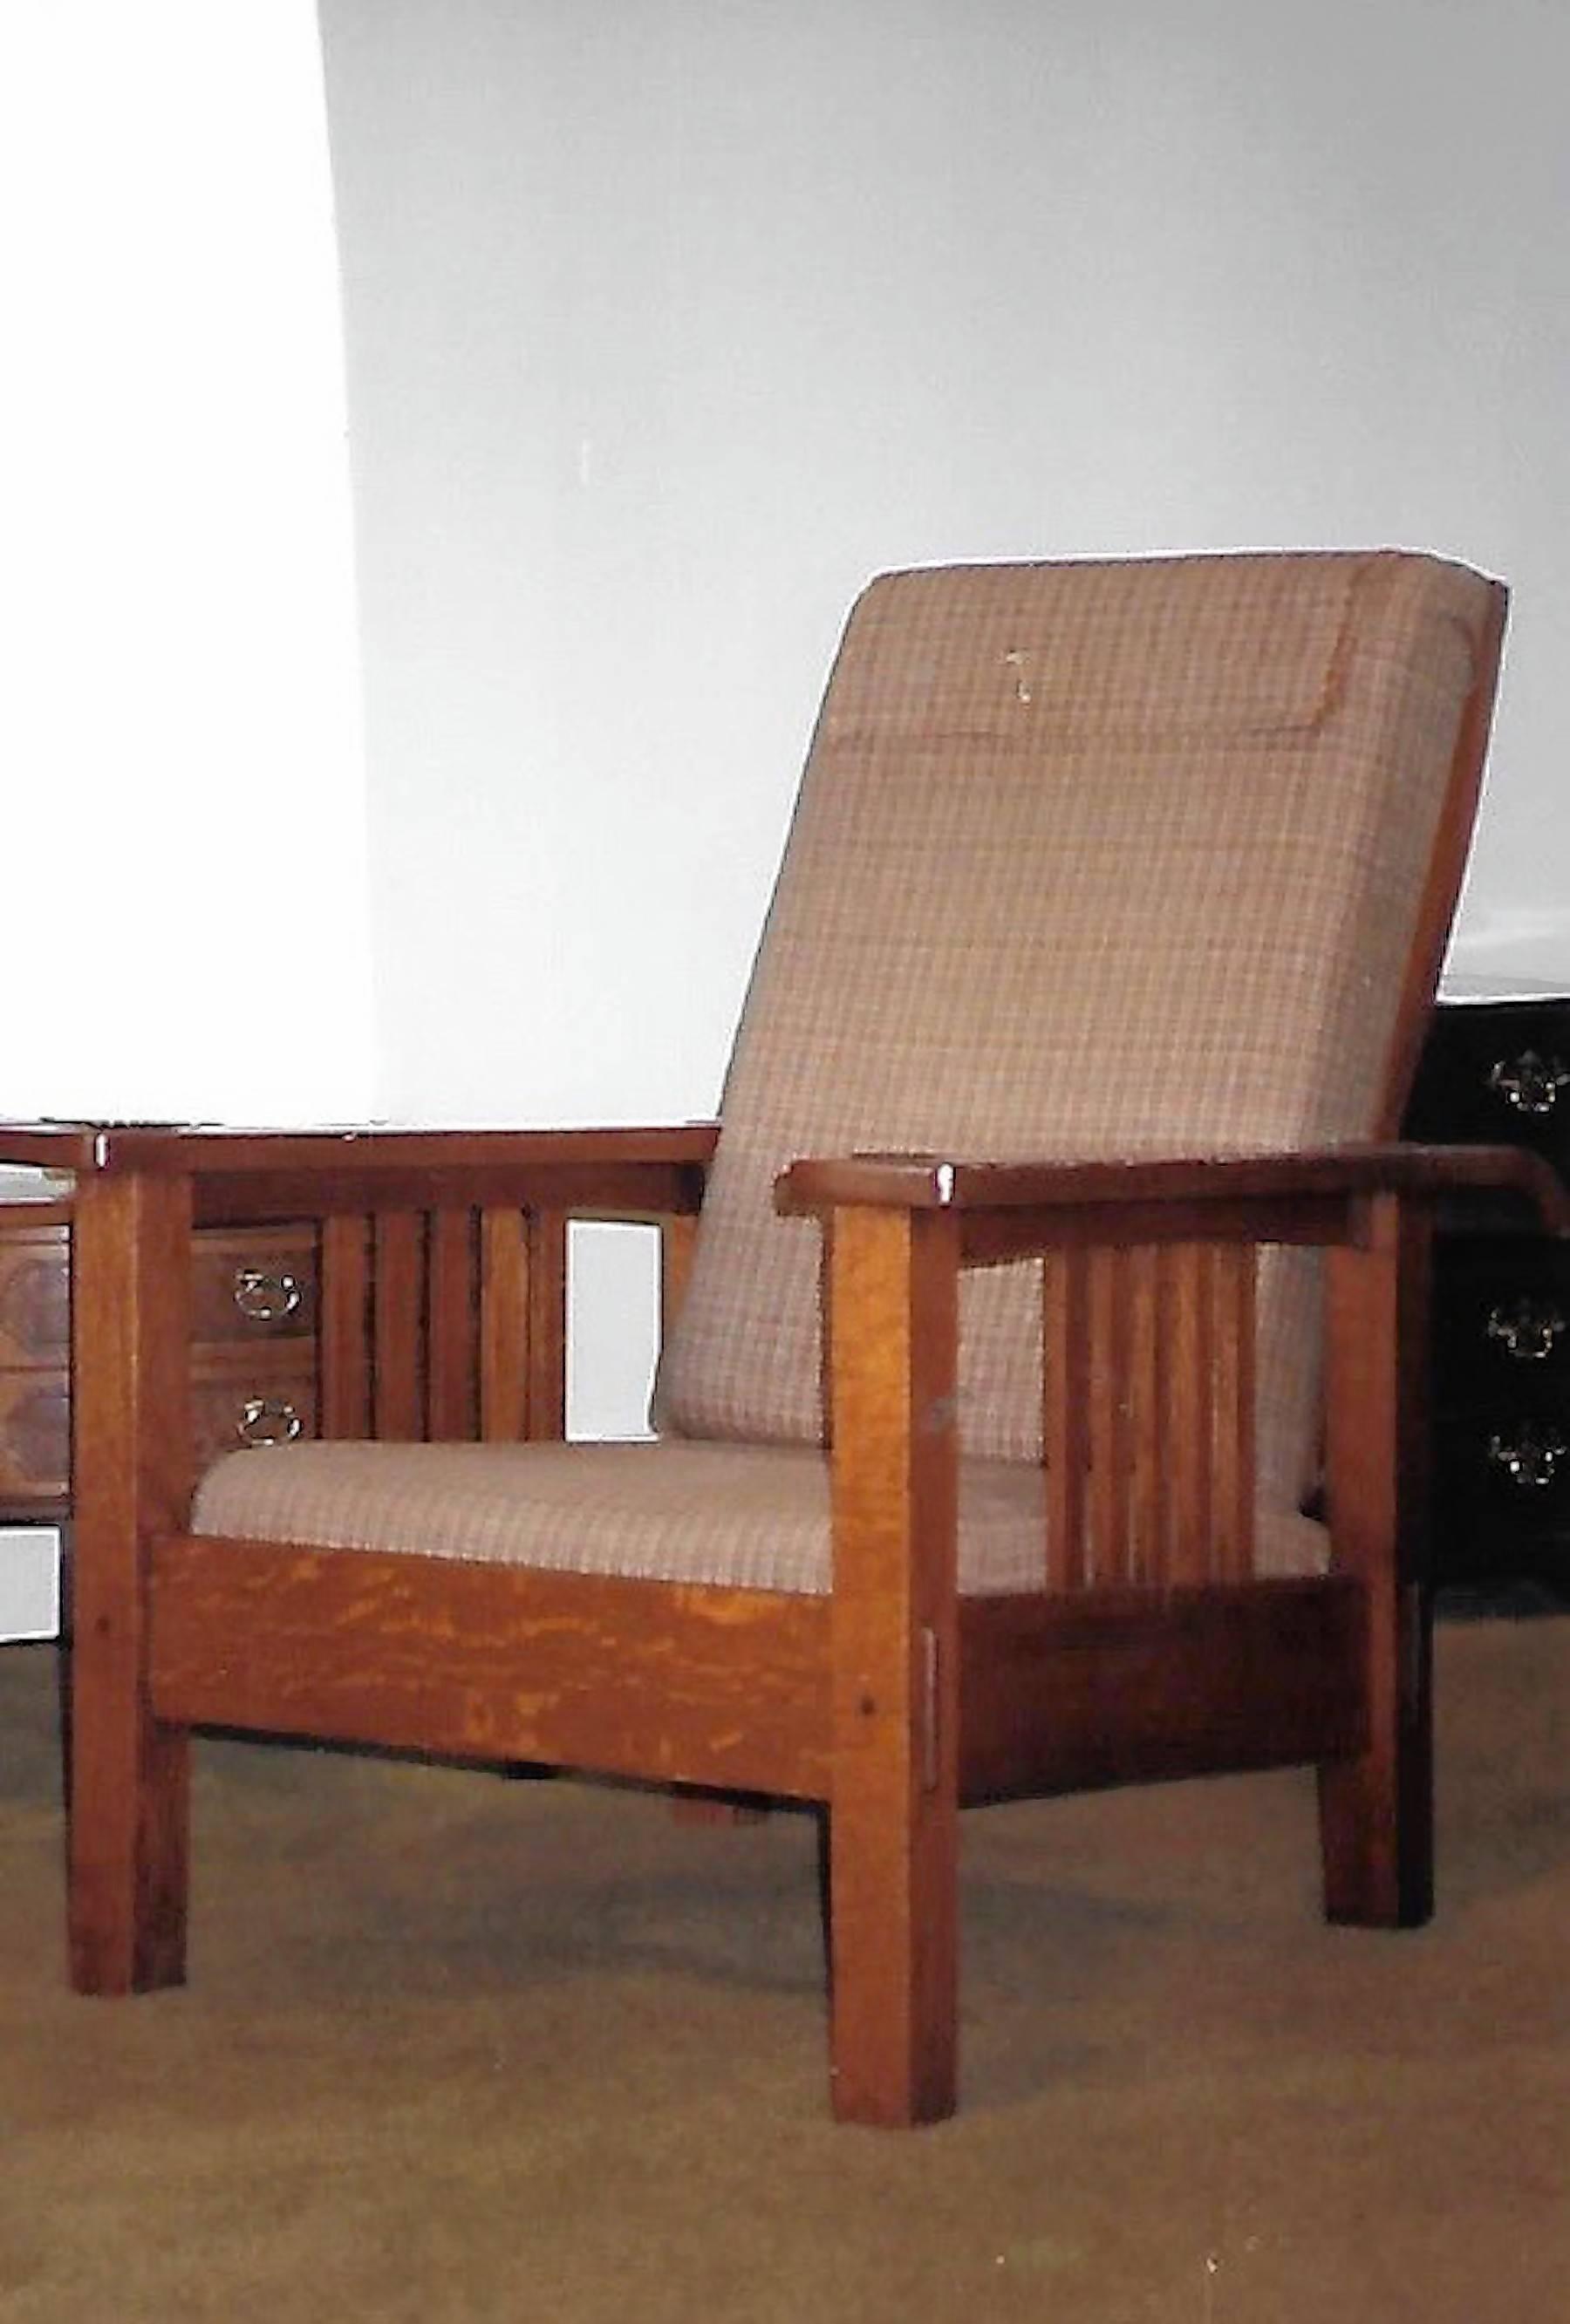 Morris Chair Design Is Attributed To William Morris.